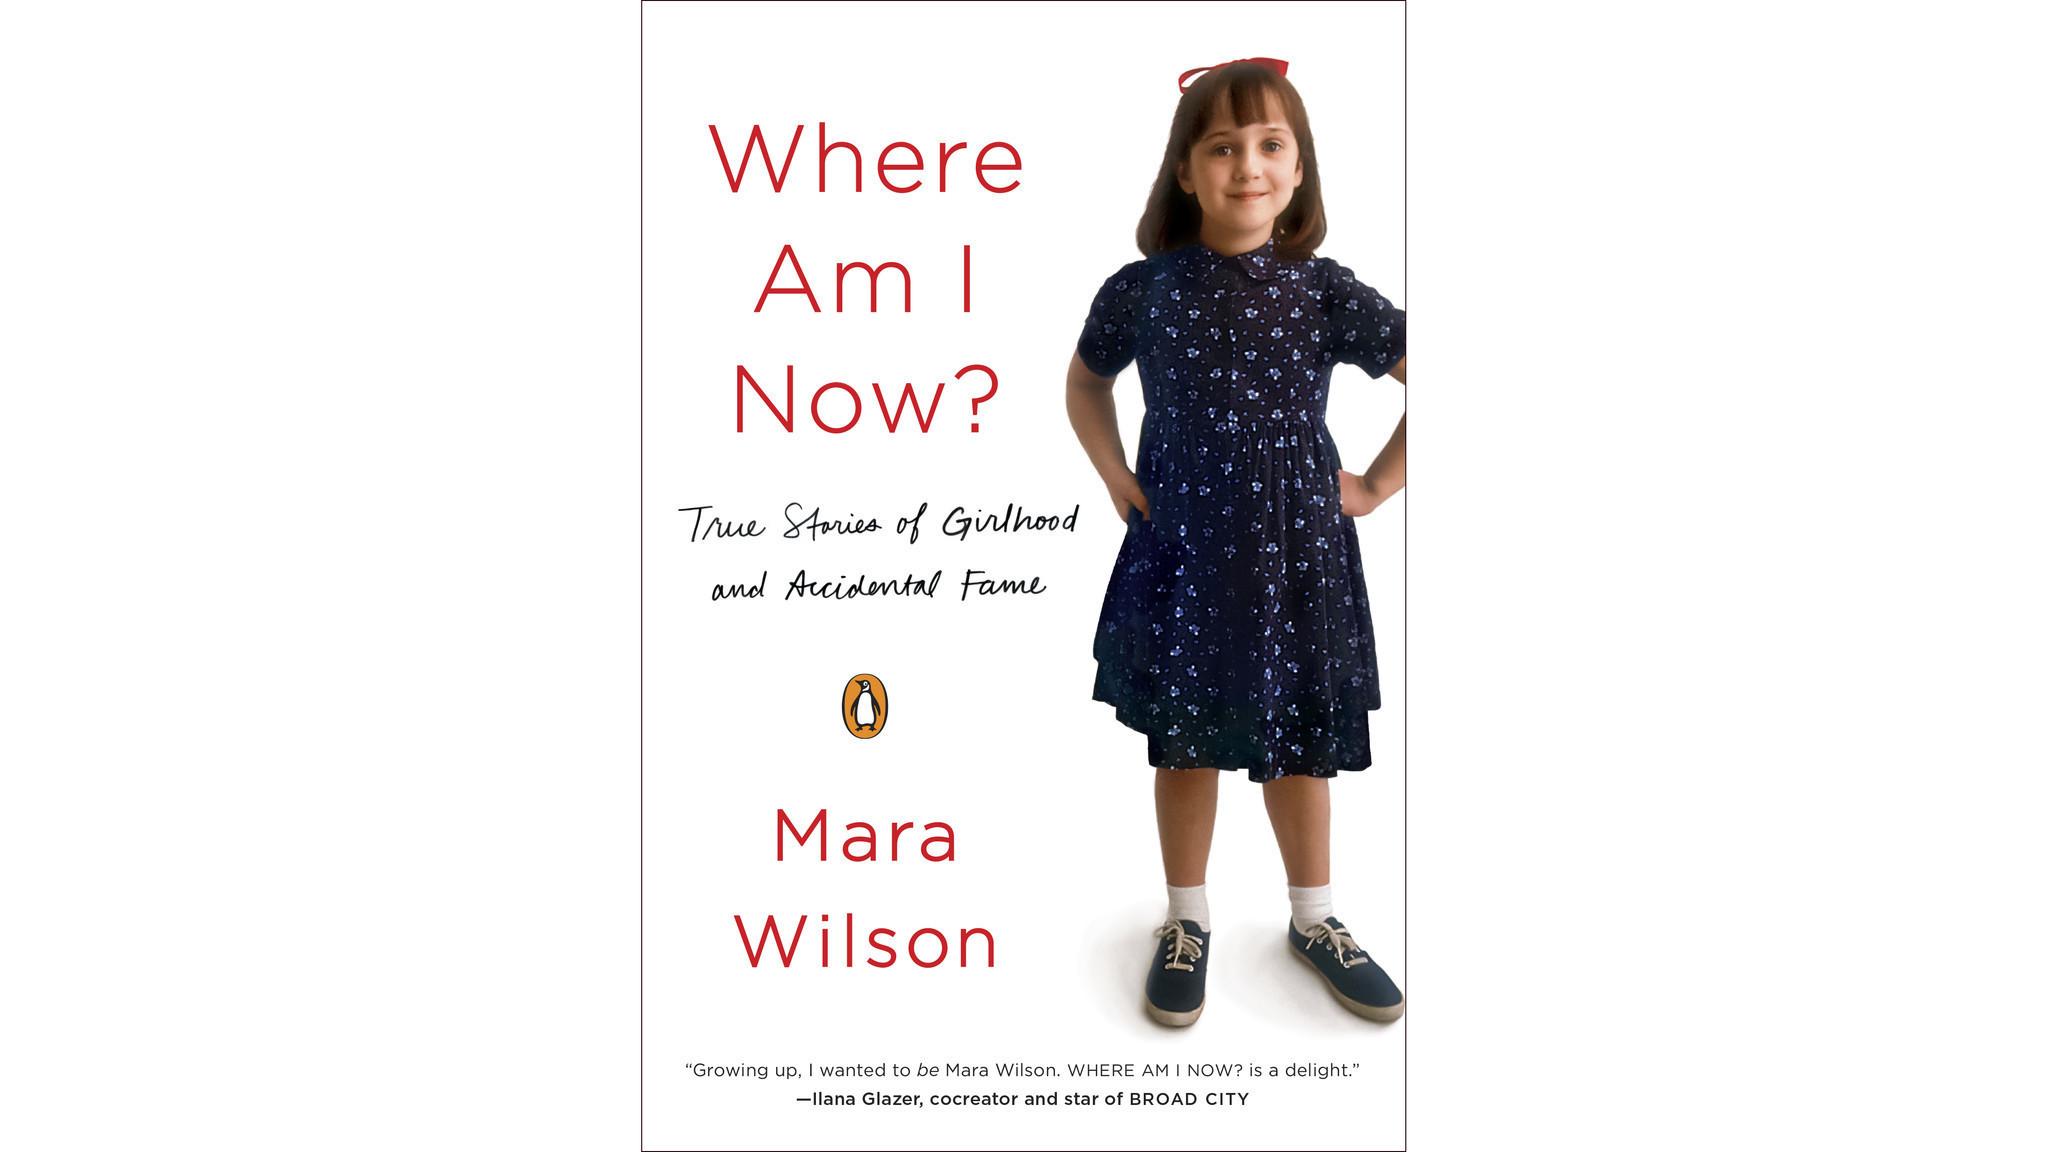 mara wilson Actress Mara Wilson has a memoir. She's not Matilda anymore. - LA Times